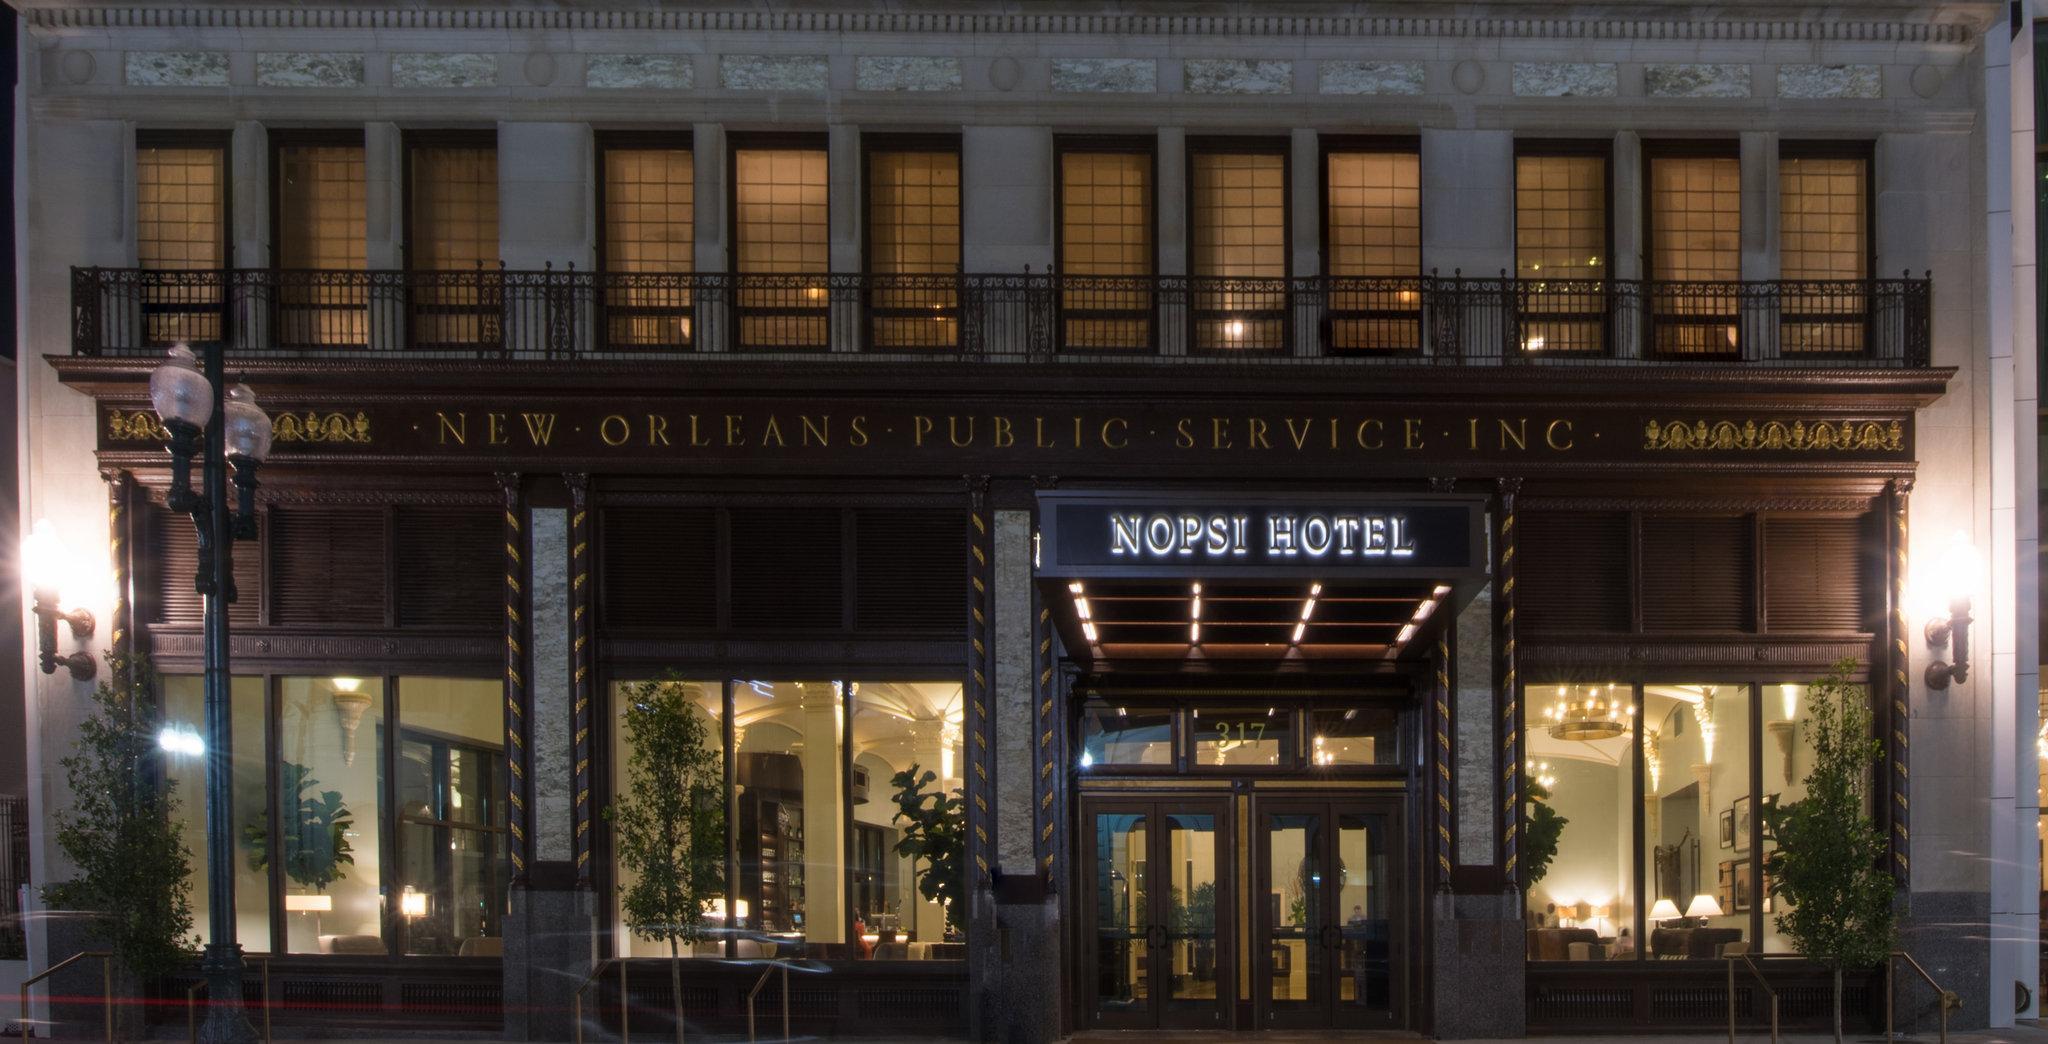 NOPSI HOTEL NEW ORLEANS